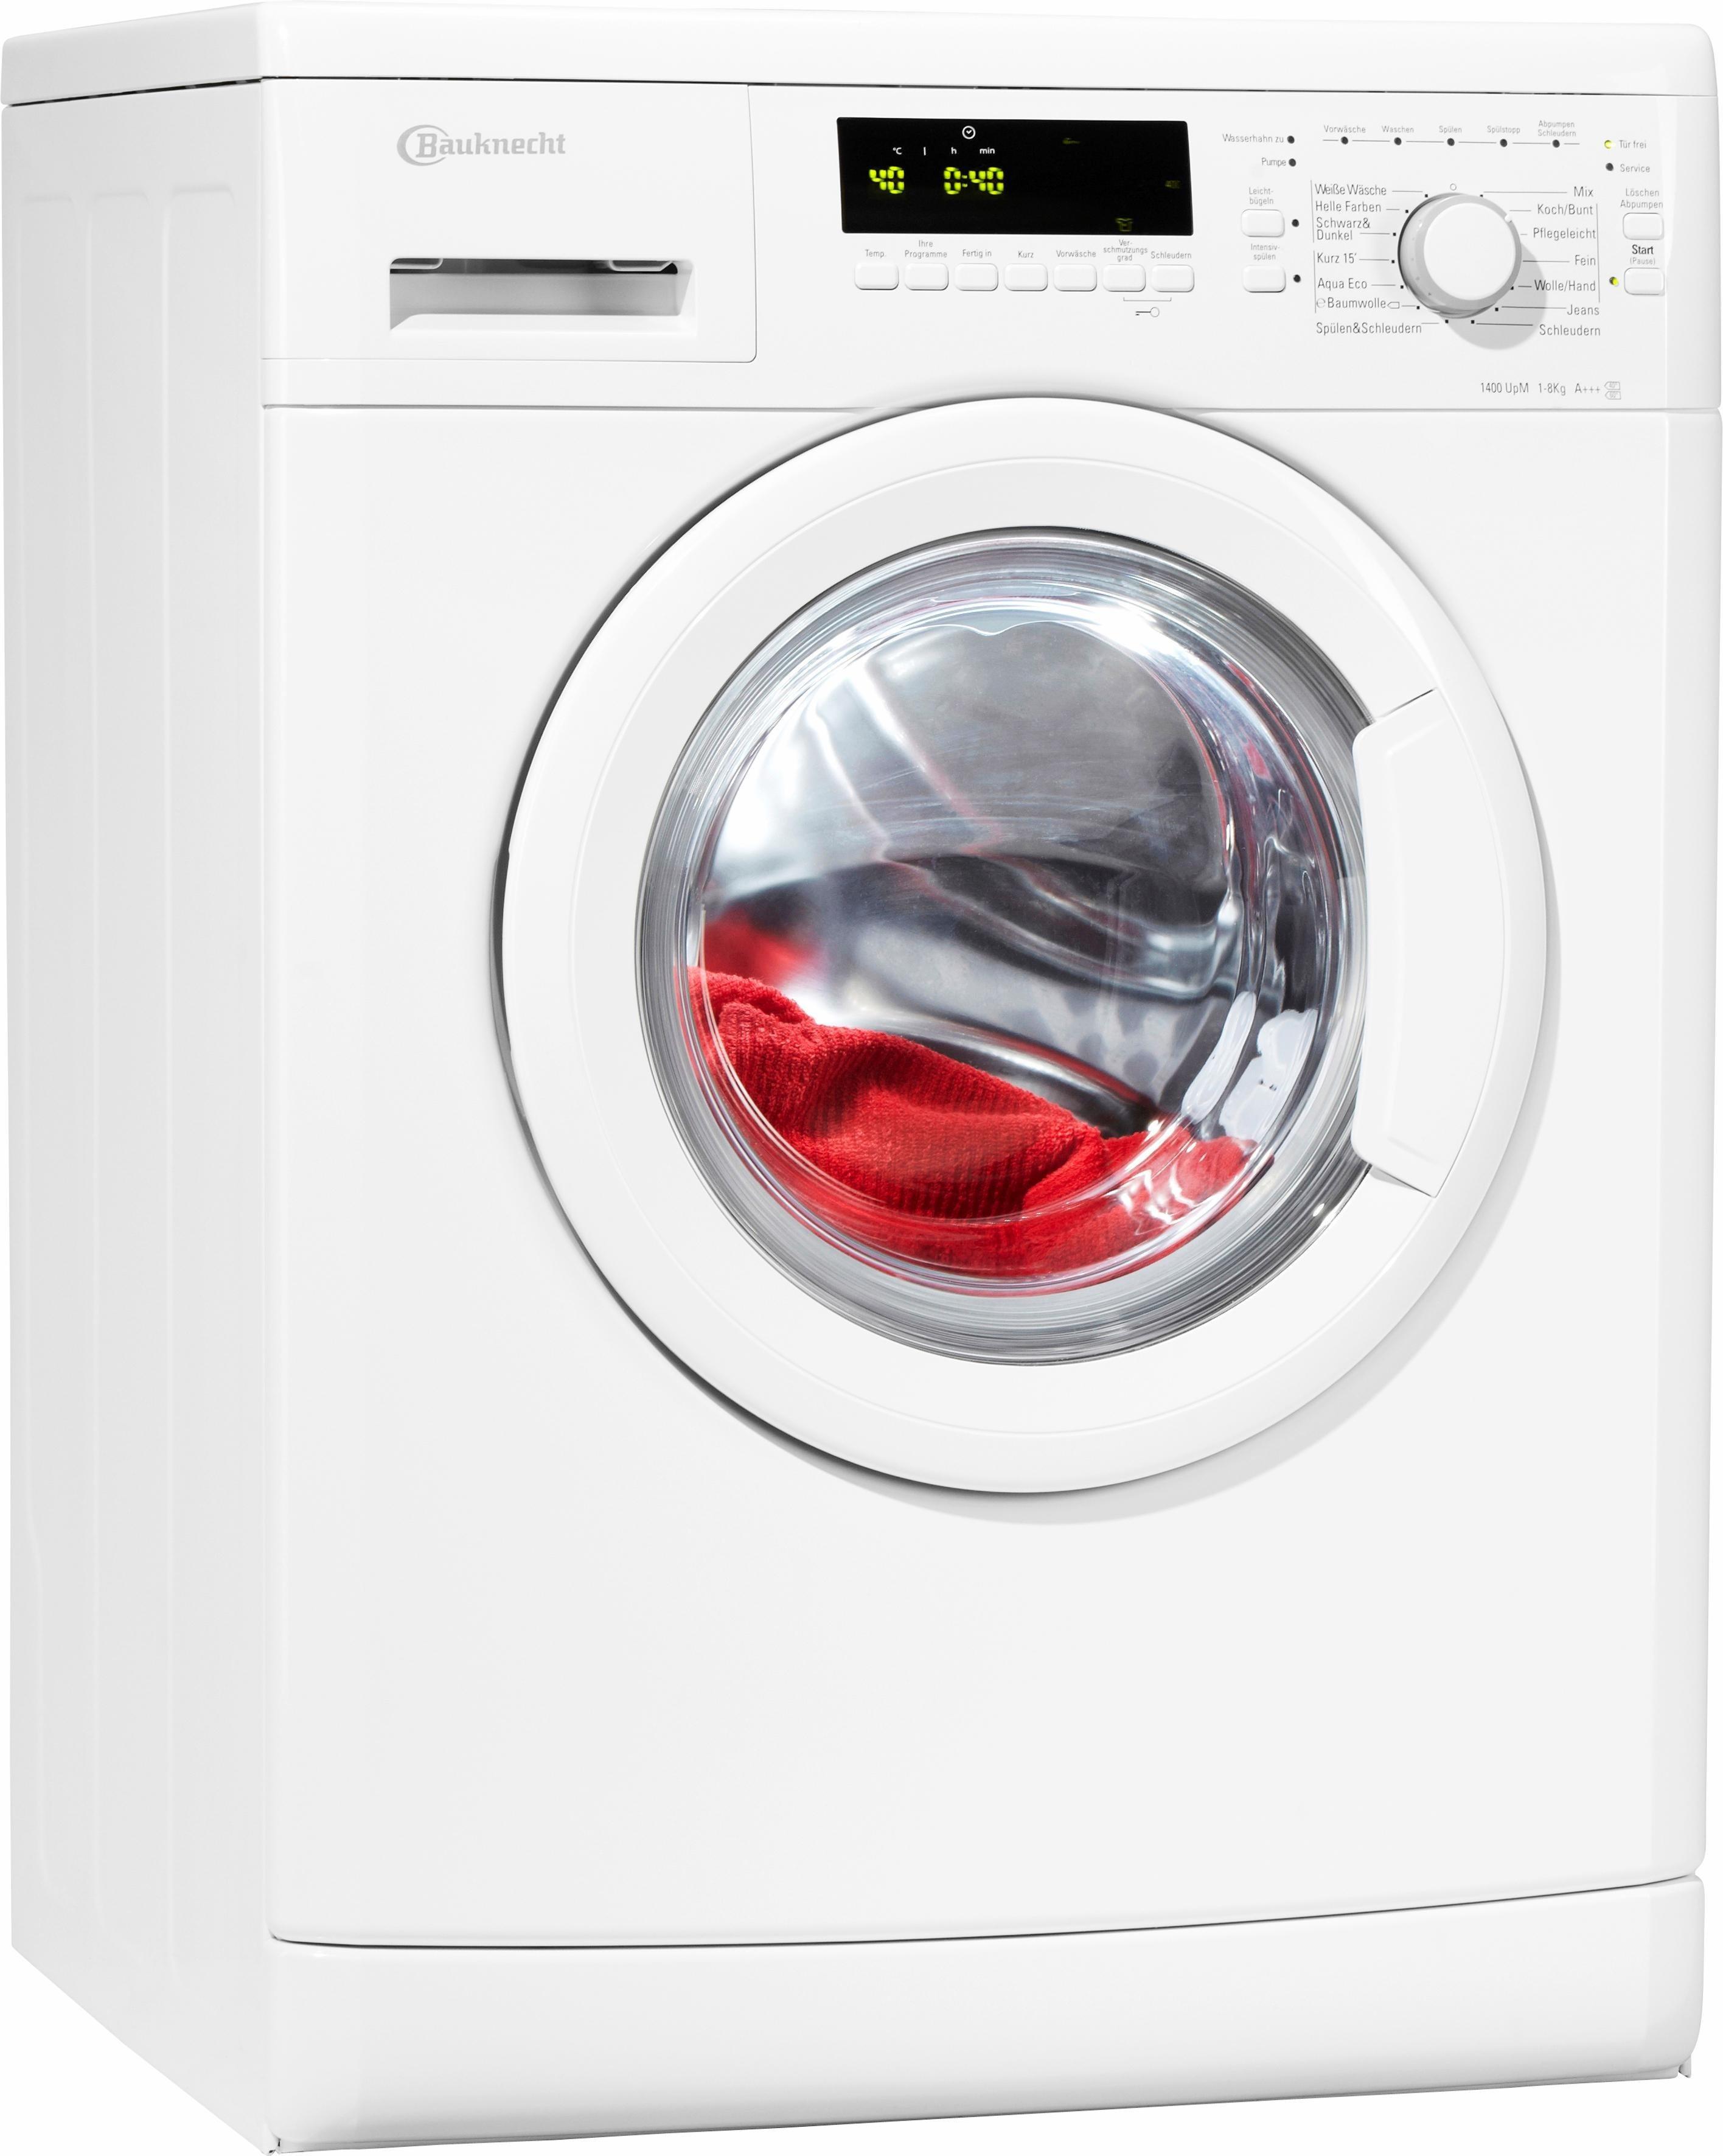 BAUKNECHT Waschmaschine WA PLUS 844 A+++, A+++, 8 kg, 1400 U/Min